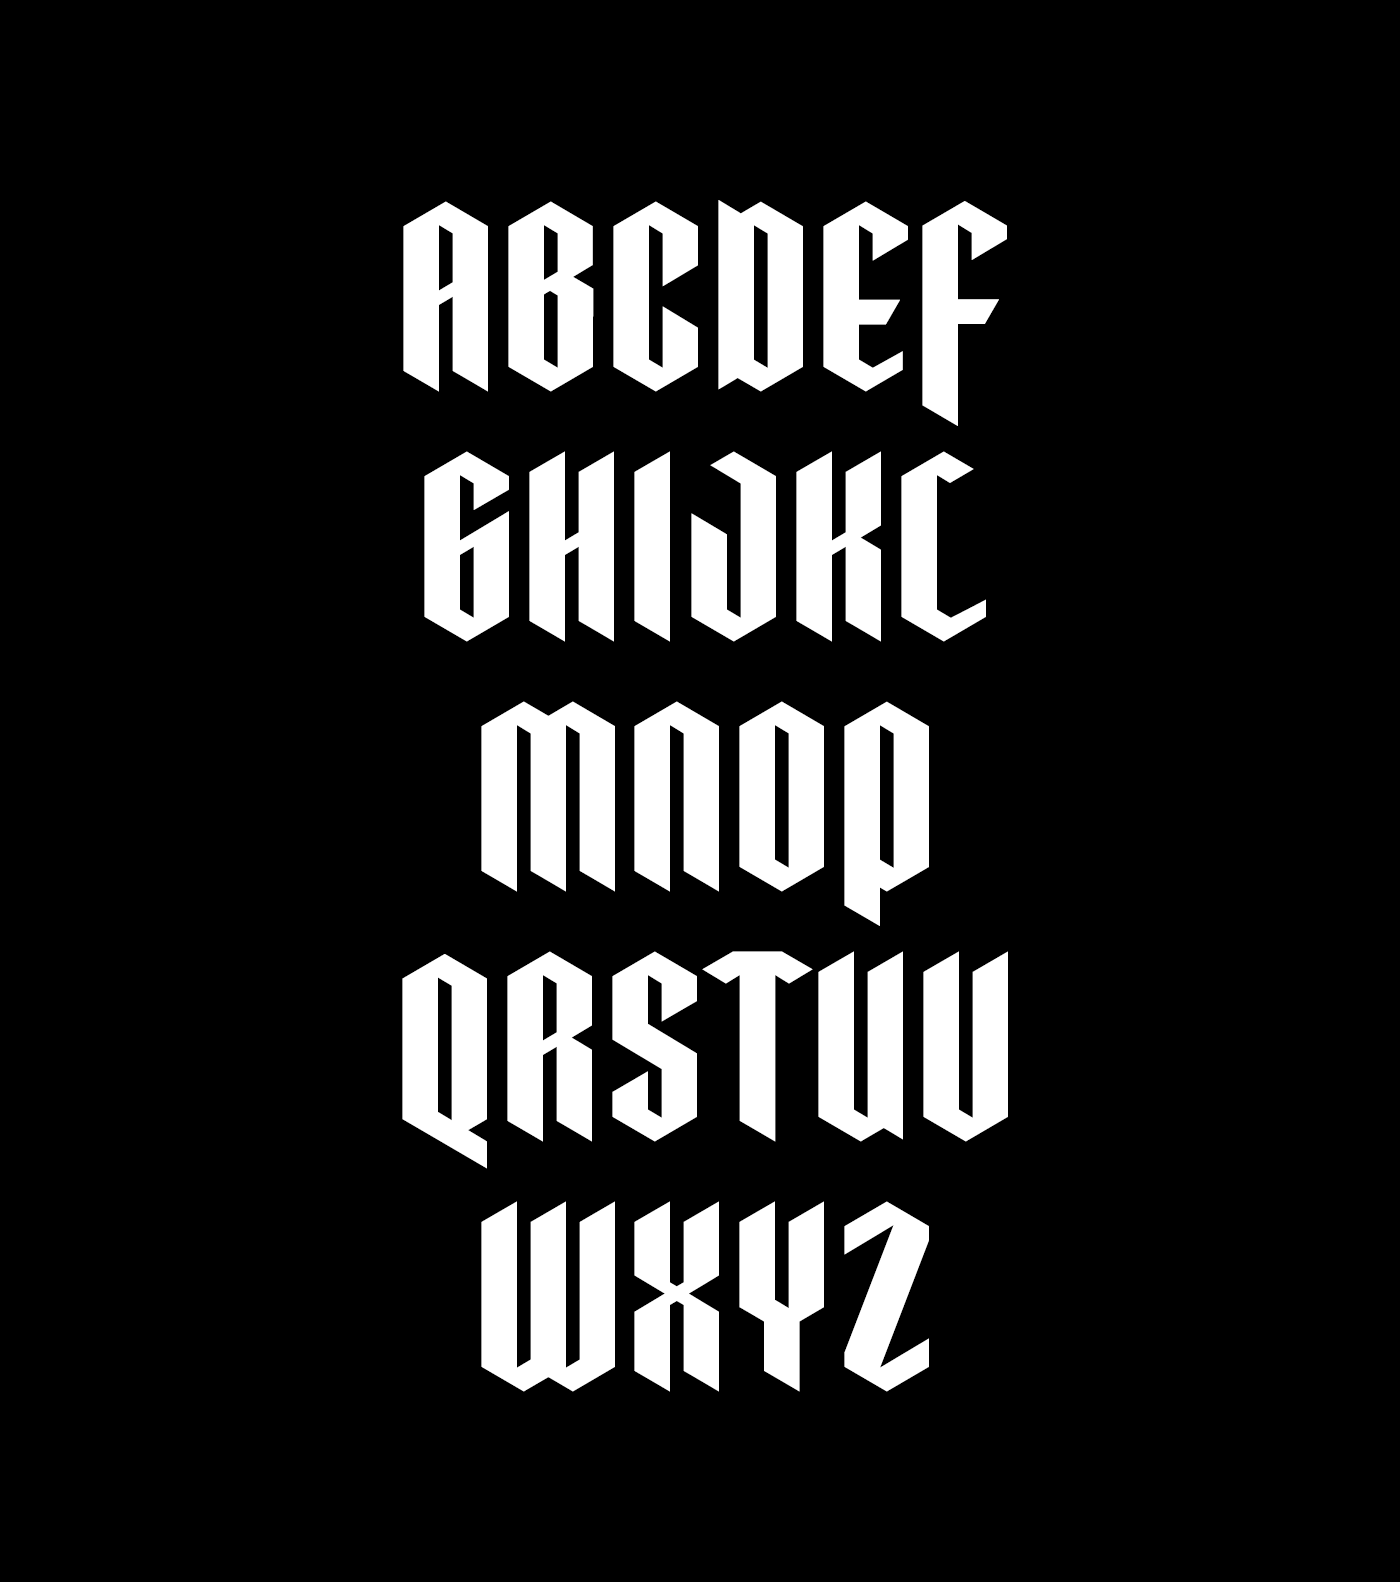 demon,Free font,Blackletter,metal font,heavy metal,power metal,nwobhm,nwothm,font,metal typeface